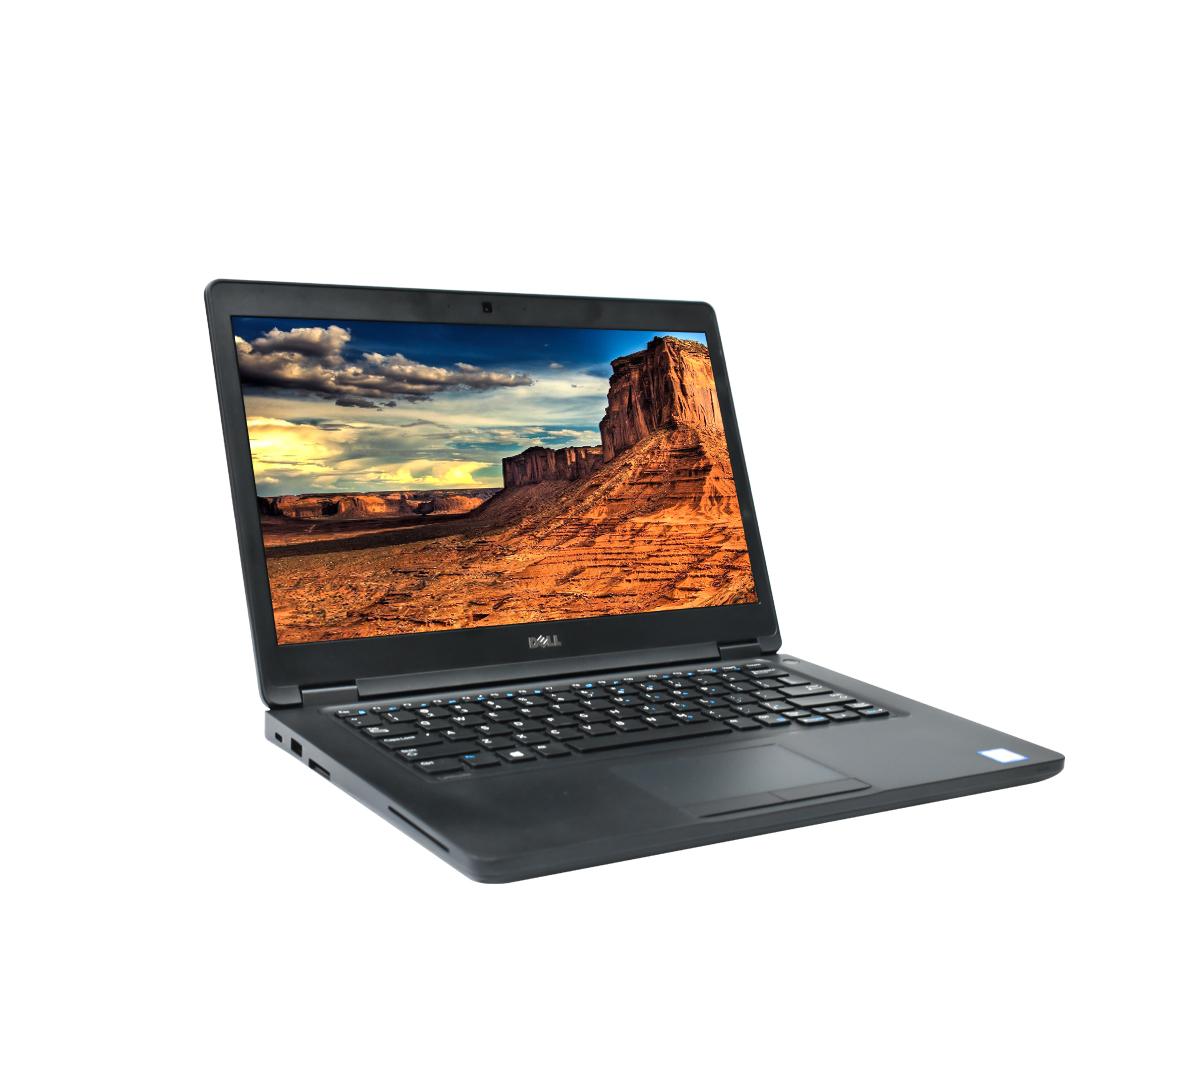 Dell Latitude 5480 Business Laptop, Intel Core i5- 6300U @ 2.40GHZ CPU, 8GB DDR4 RAM, 256SSD, 14 inch Display, Windows 10 (Refurbished)